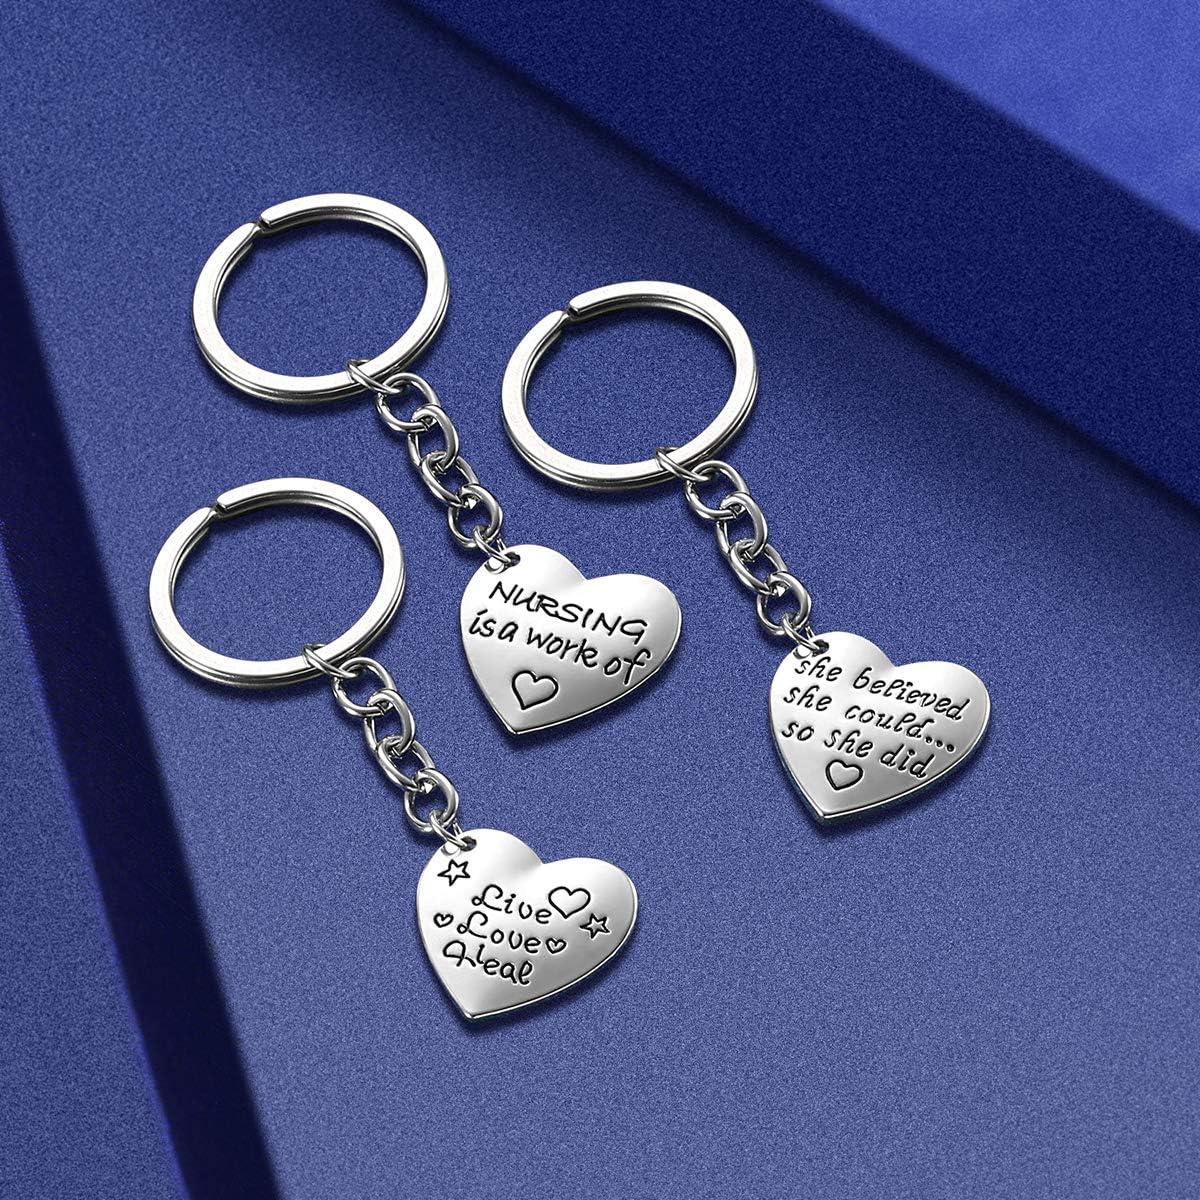 Nurse Gifts for Women - Nurse Keychain Pack of 3PCS, Nursing Graduation Gifts, Valentines Birthday Gift for Nurses Practitioner, Blue Pink White ...